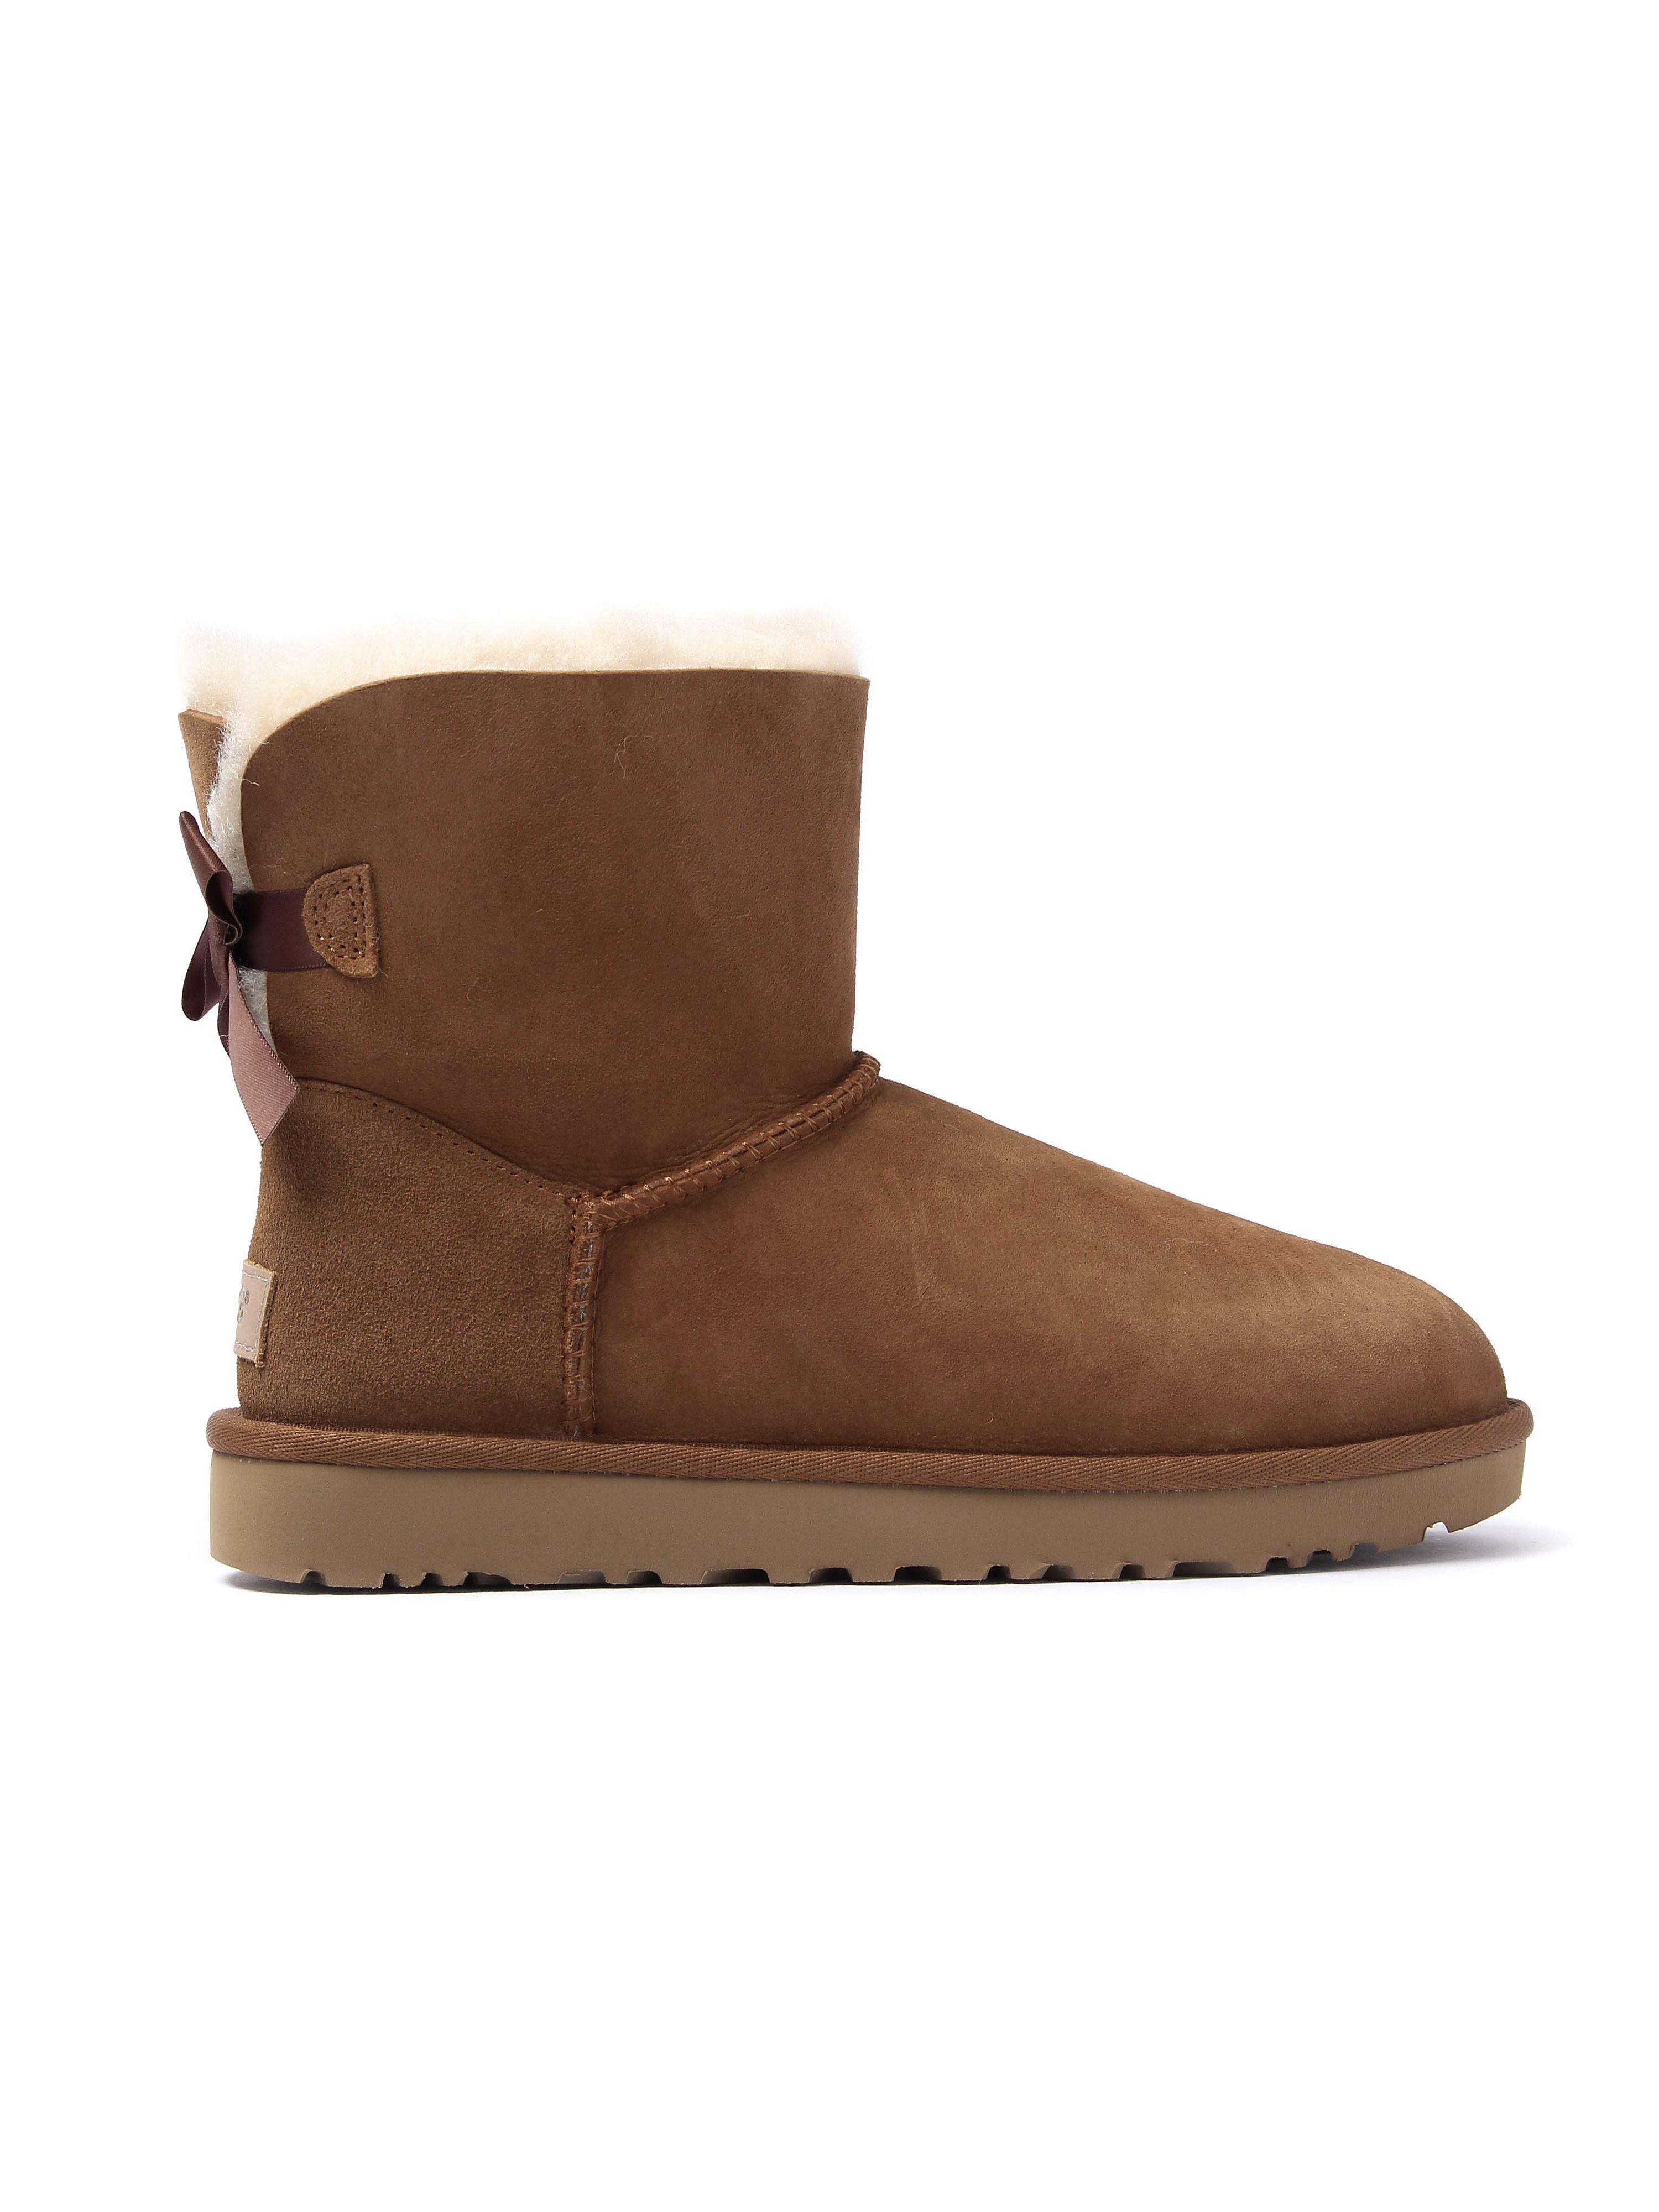 Ugg Women's Bailey Bow II Sheepskin Boots - Chestnut